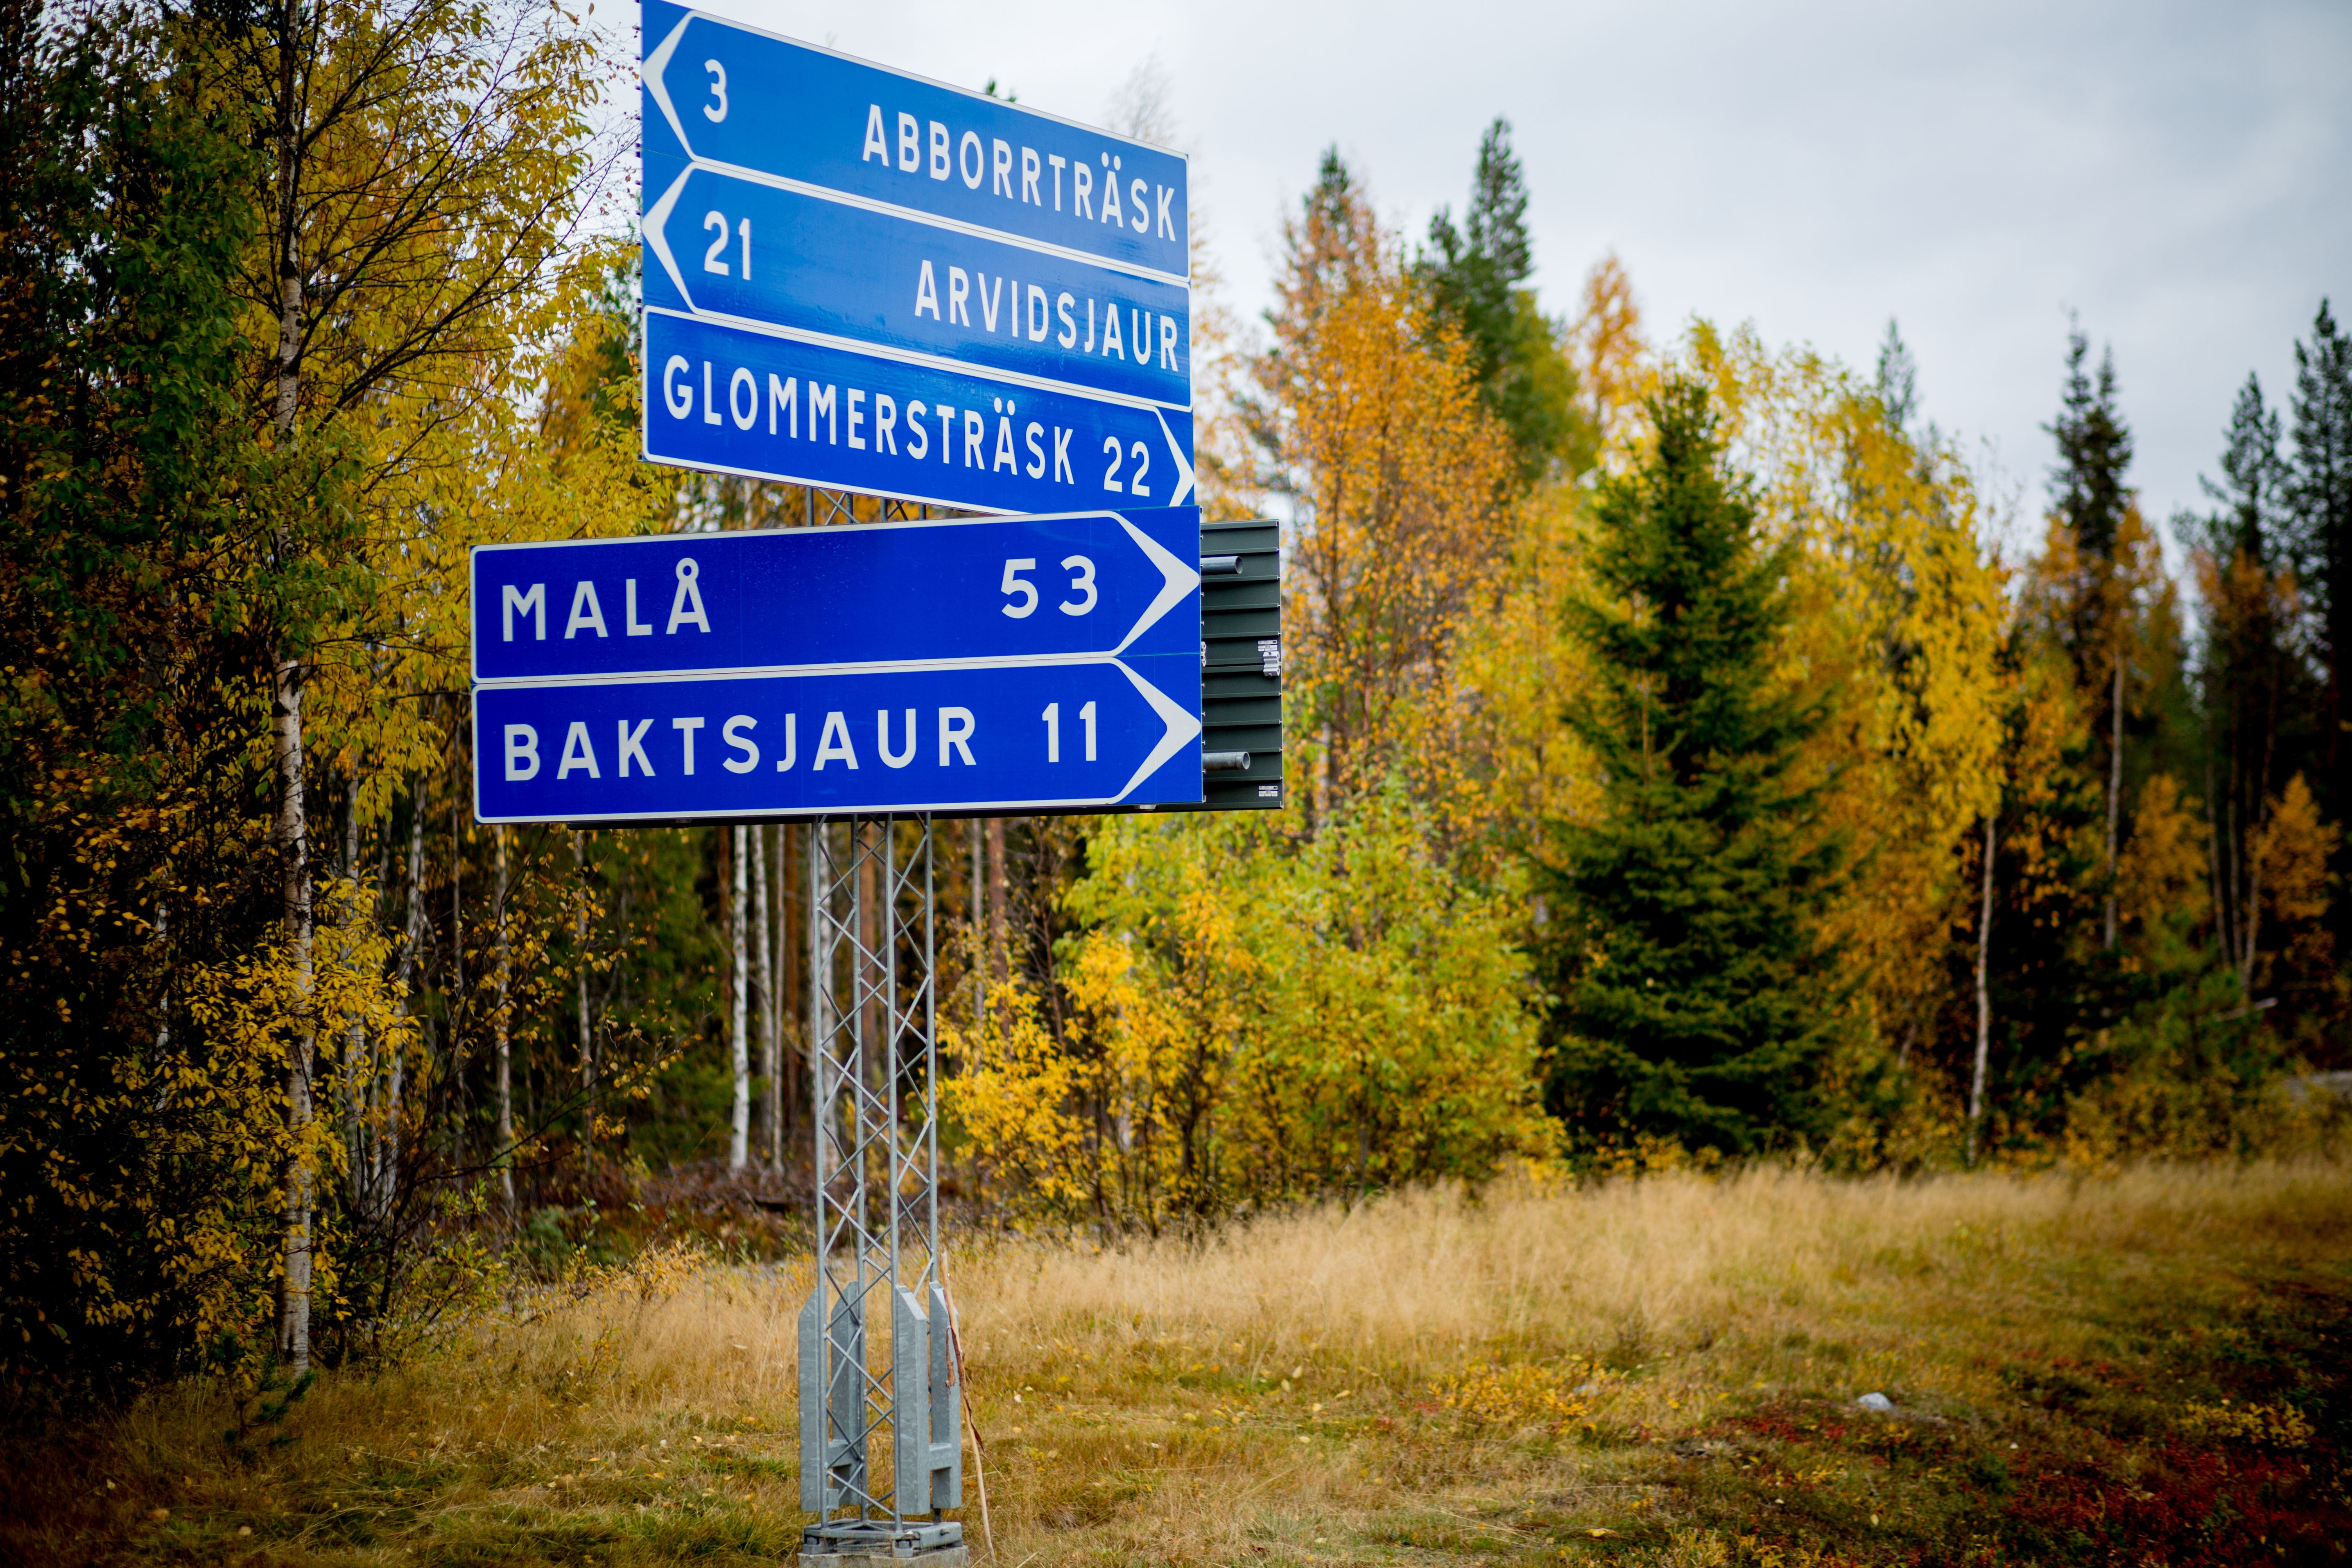 Gomorron Malå